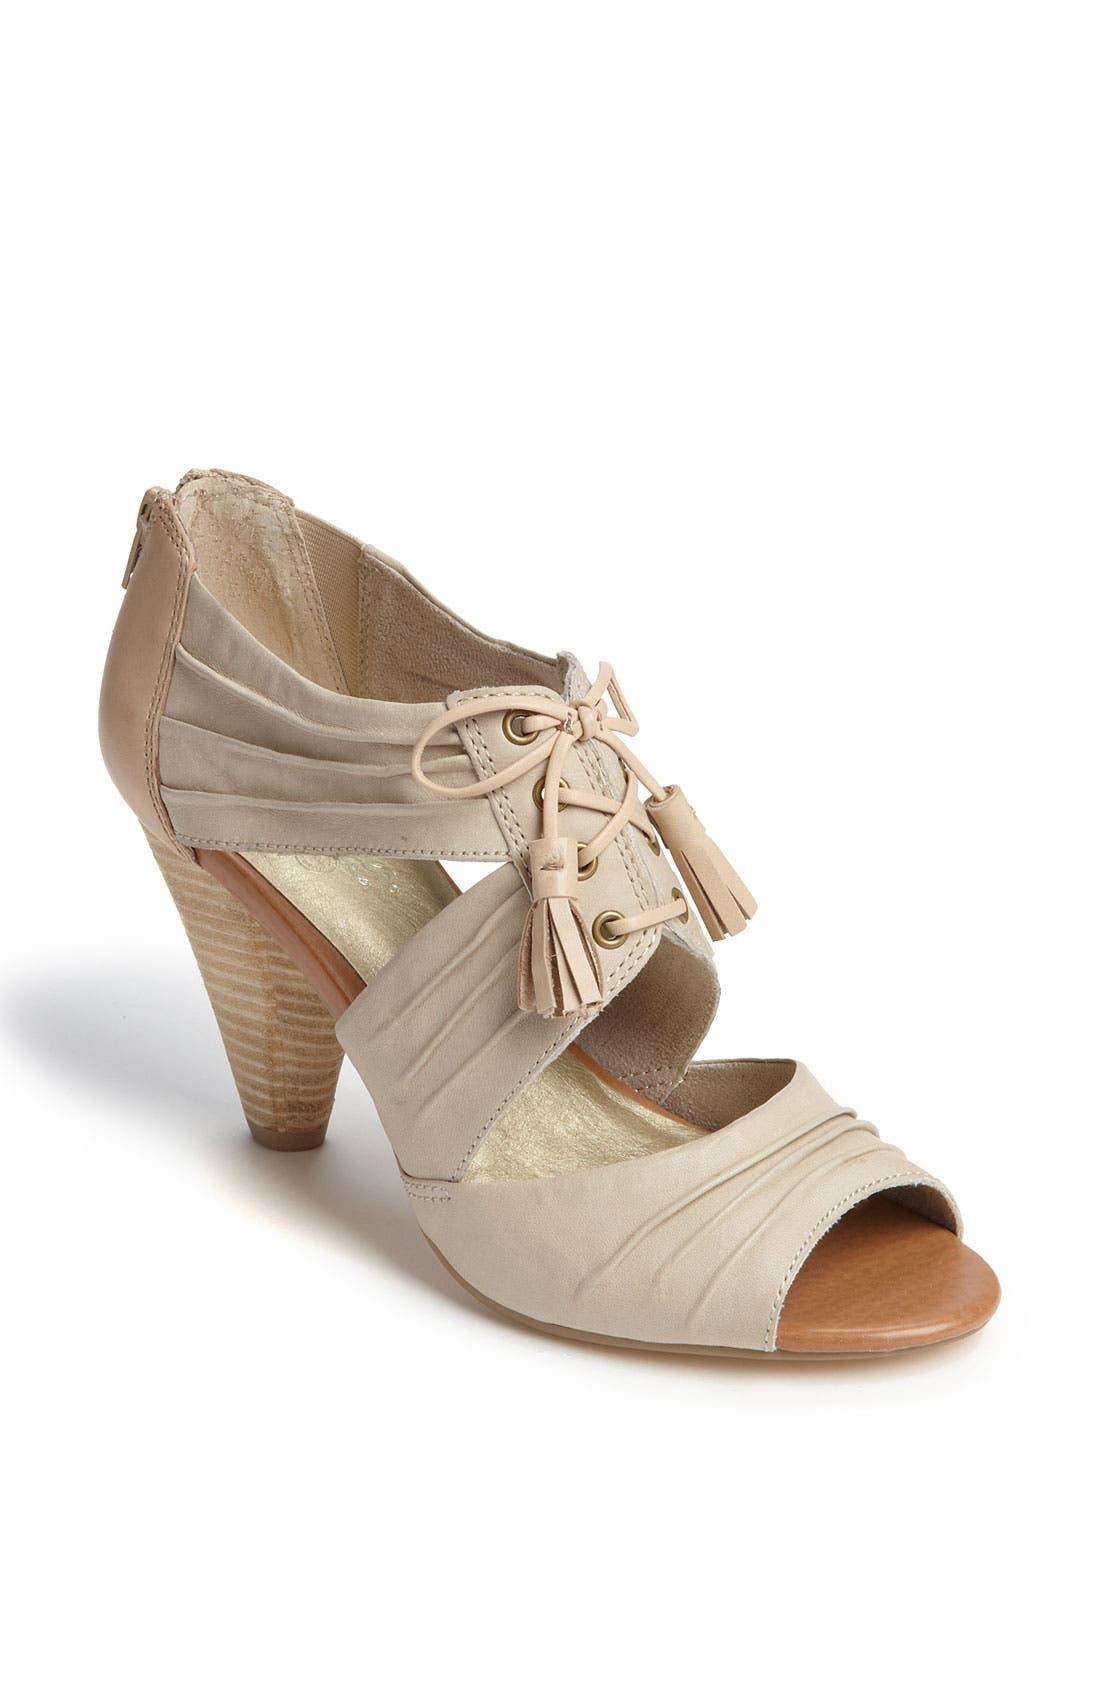 Alternate Image 1 Selected - Seychelles 'Solo' Sandal